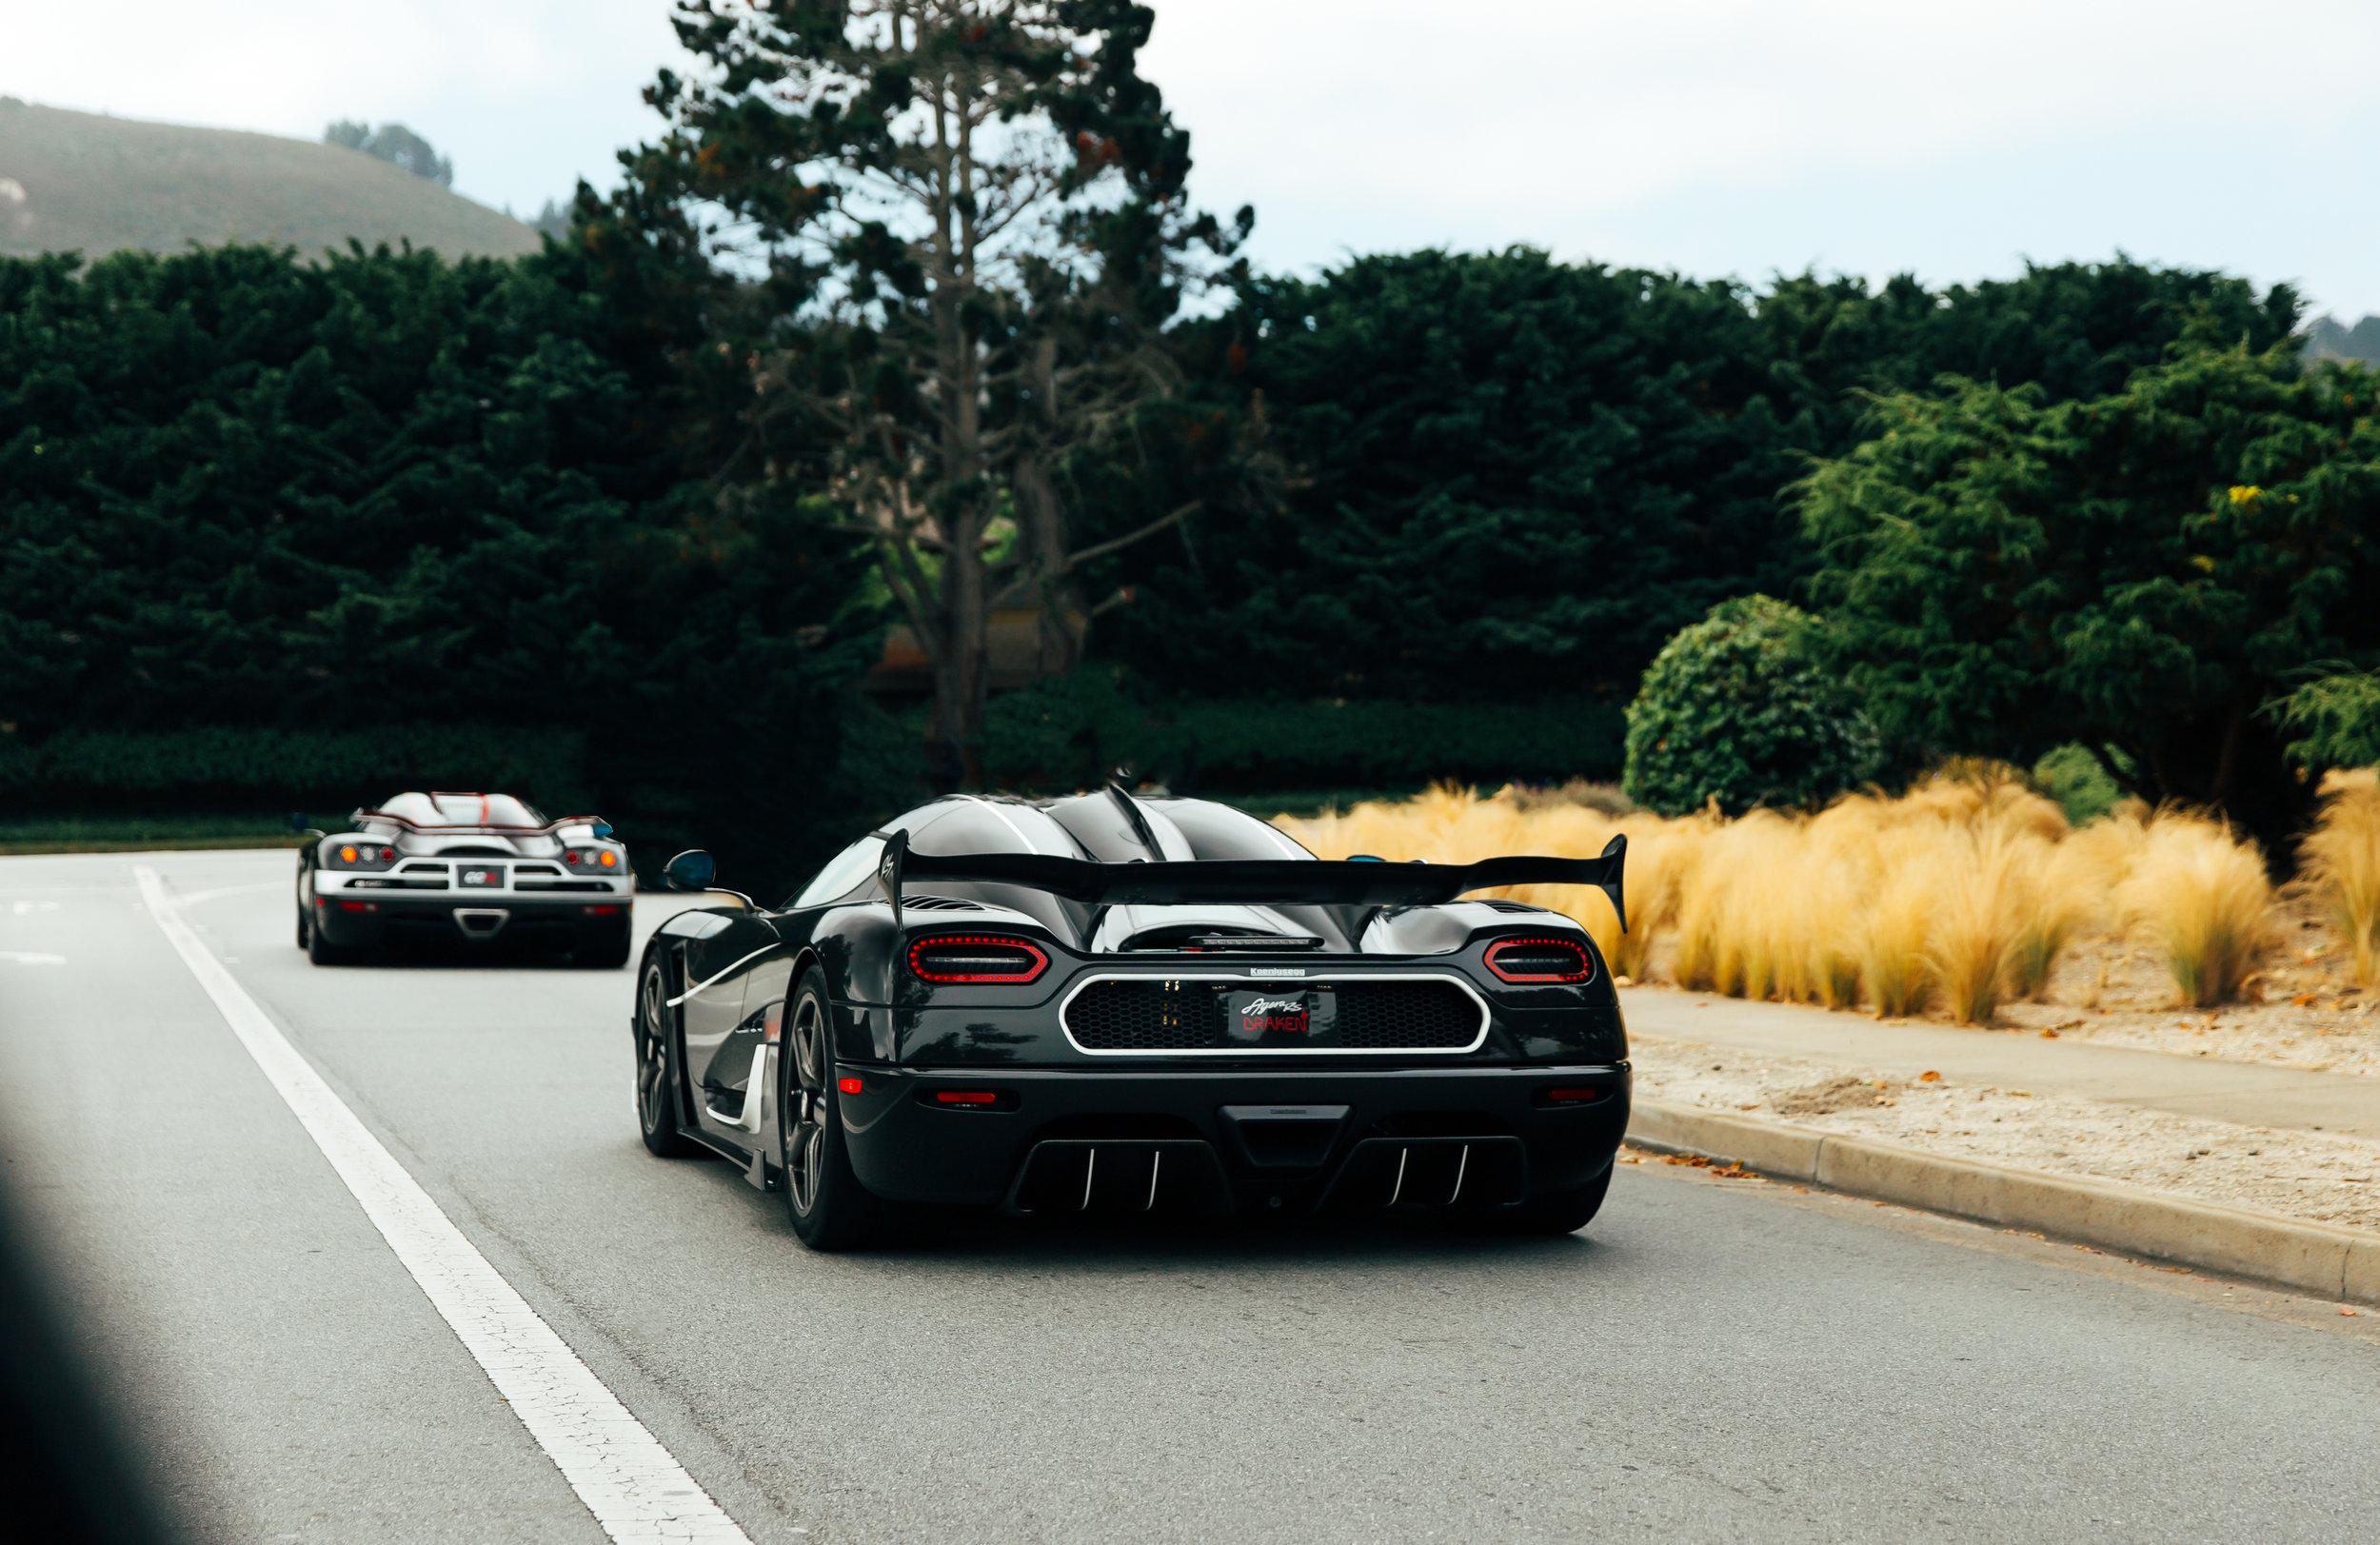 Stay_Driven_Monterey_Car_Week_Koenigsegg-18.jpg